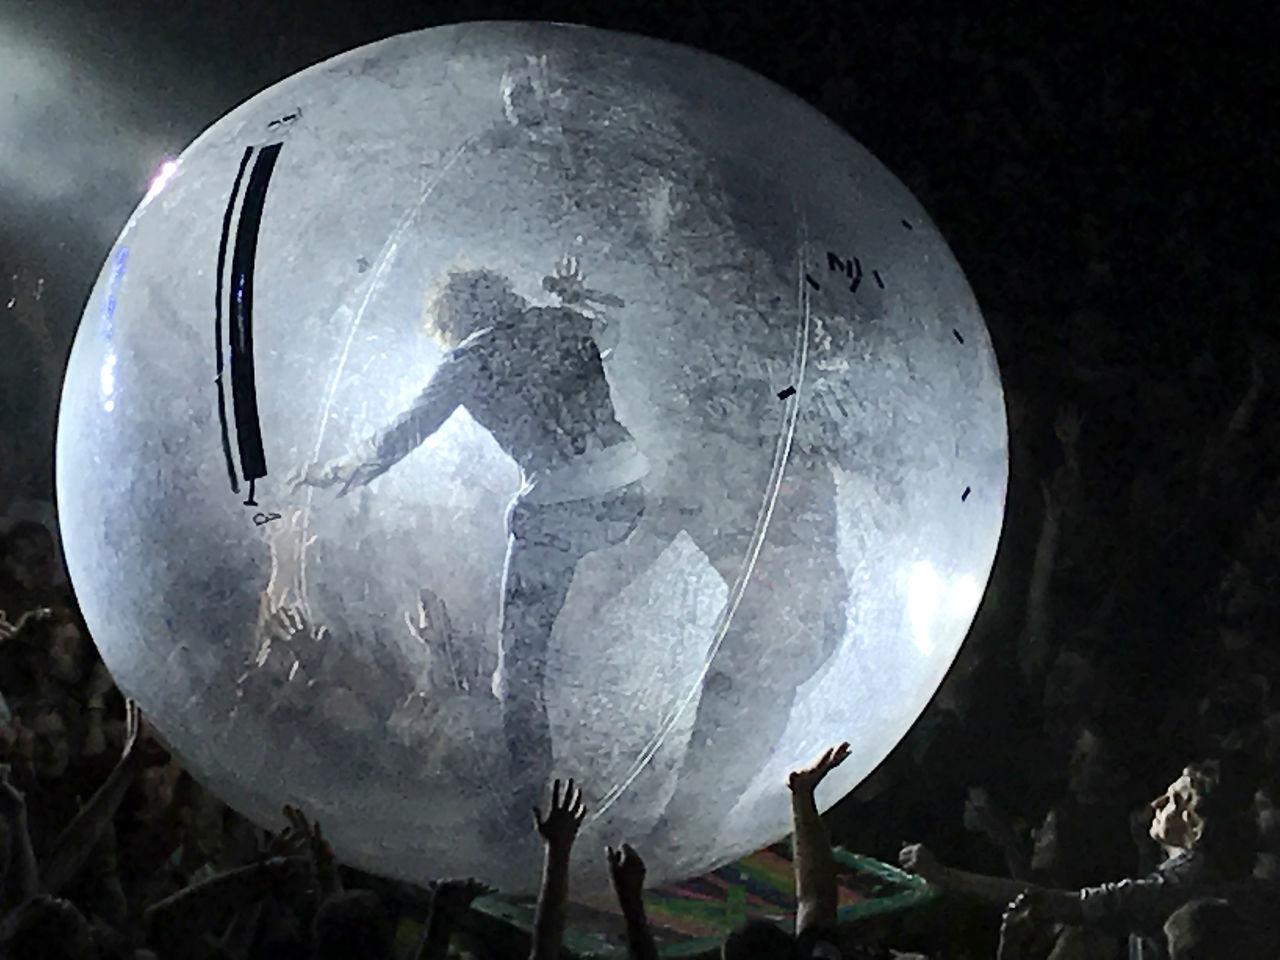 Flaming Lips 👄 Music The Ball The Rave Bands Close-up Concert Major Tom Milwaukee, Wisconsin Theatrics Wayne Coyne